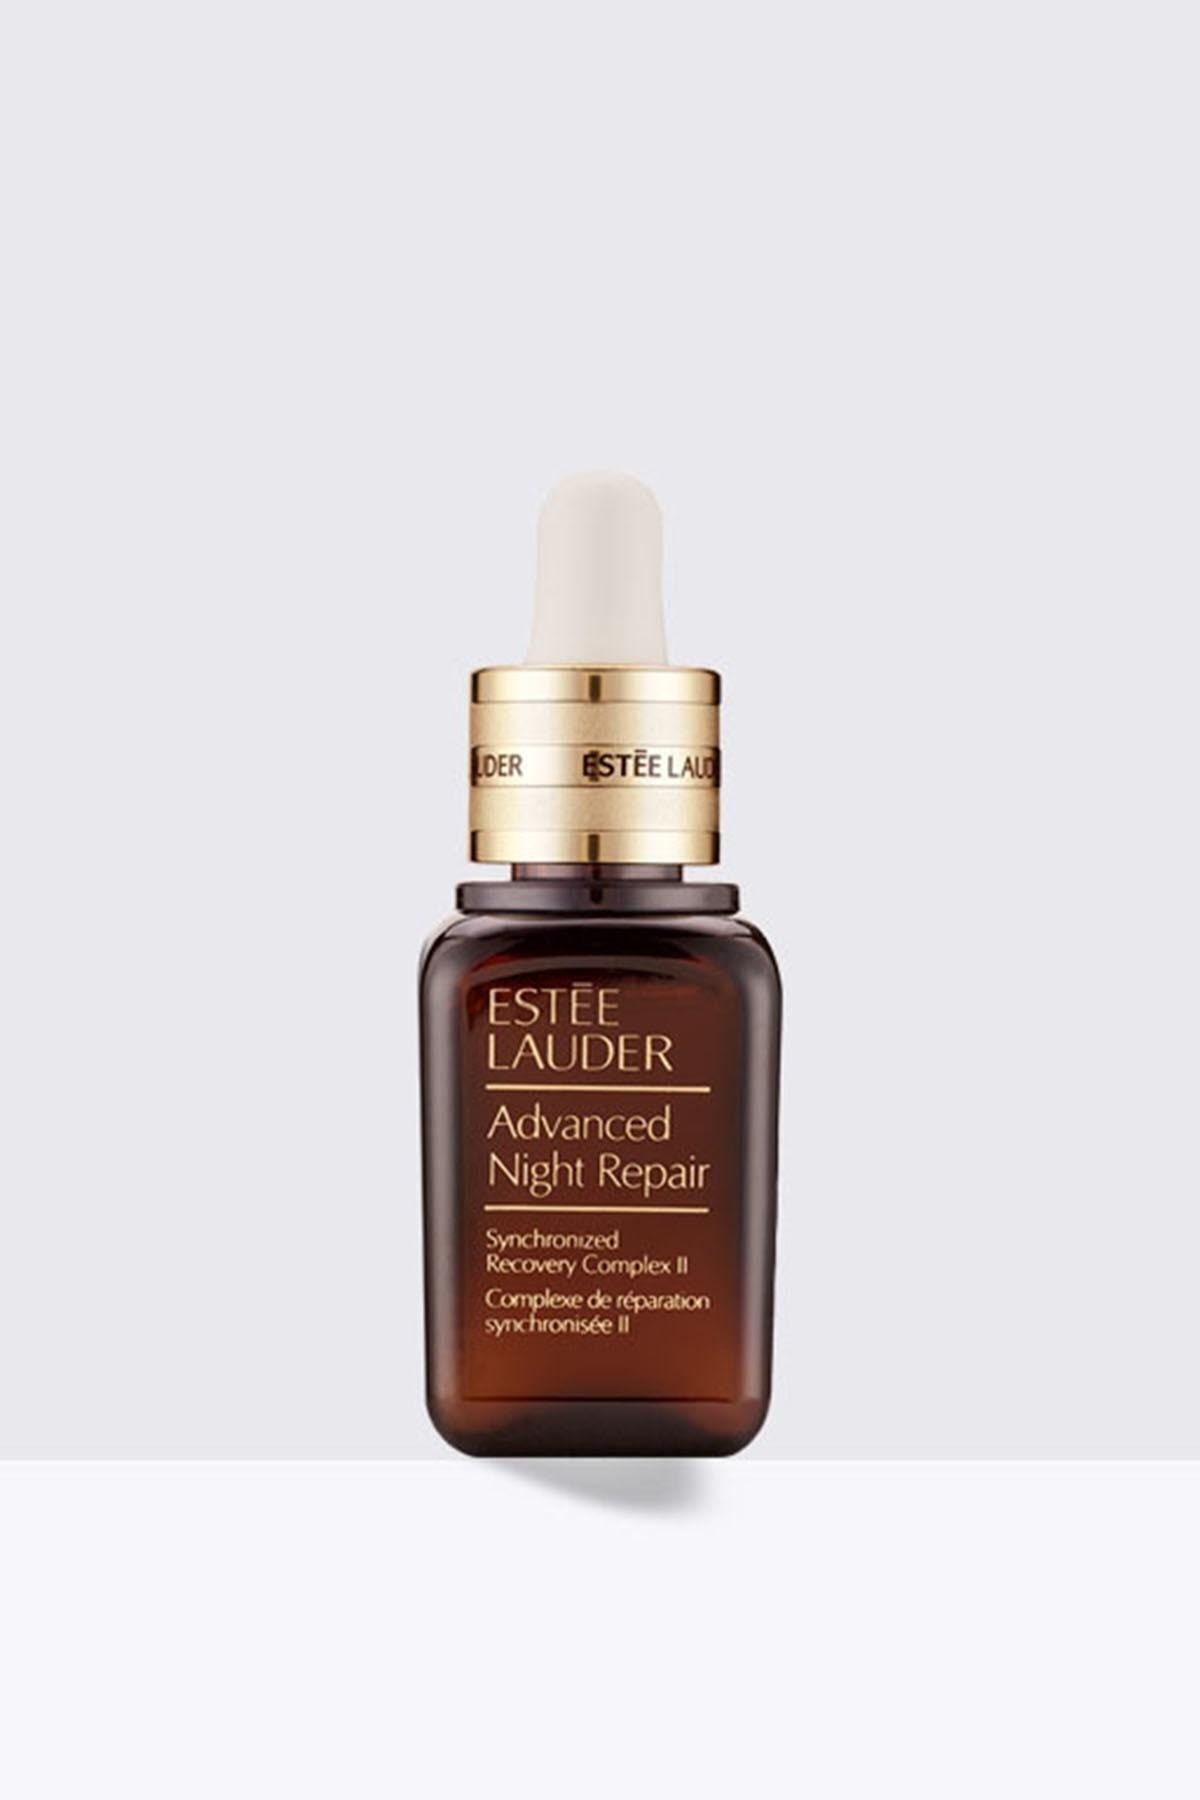 Estee Lauder Yaşlanma Karşıtı Gece Serumu - Advanced Night Repair 20 ml 1